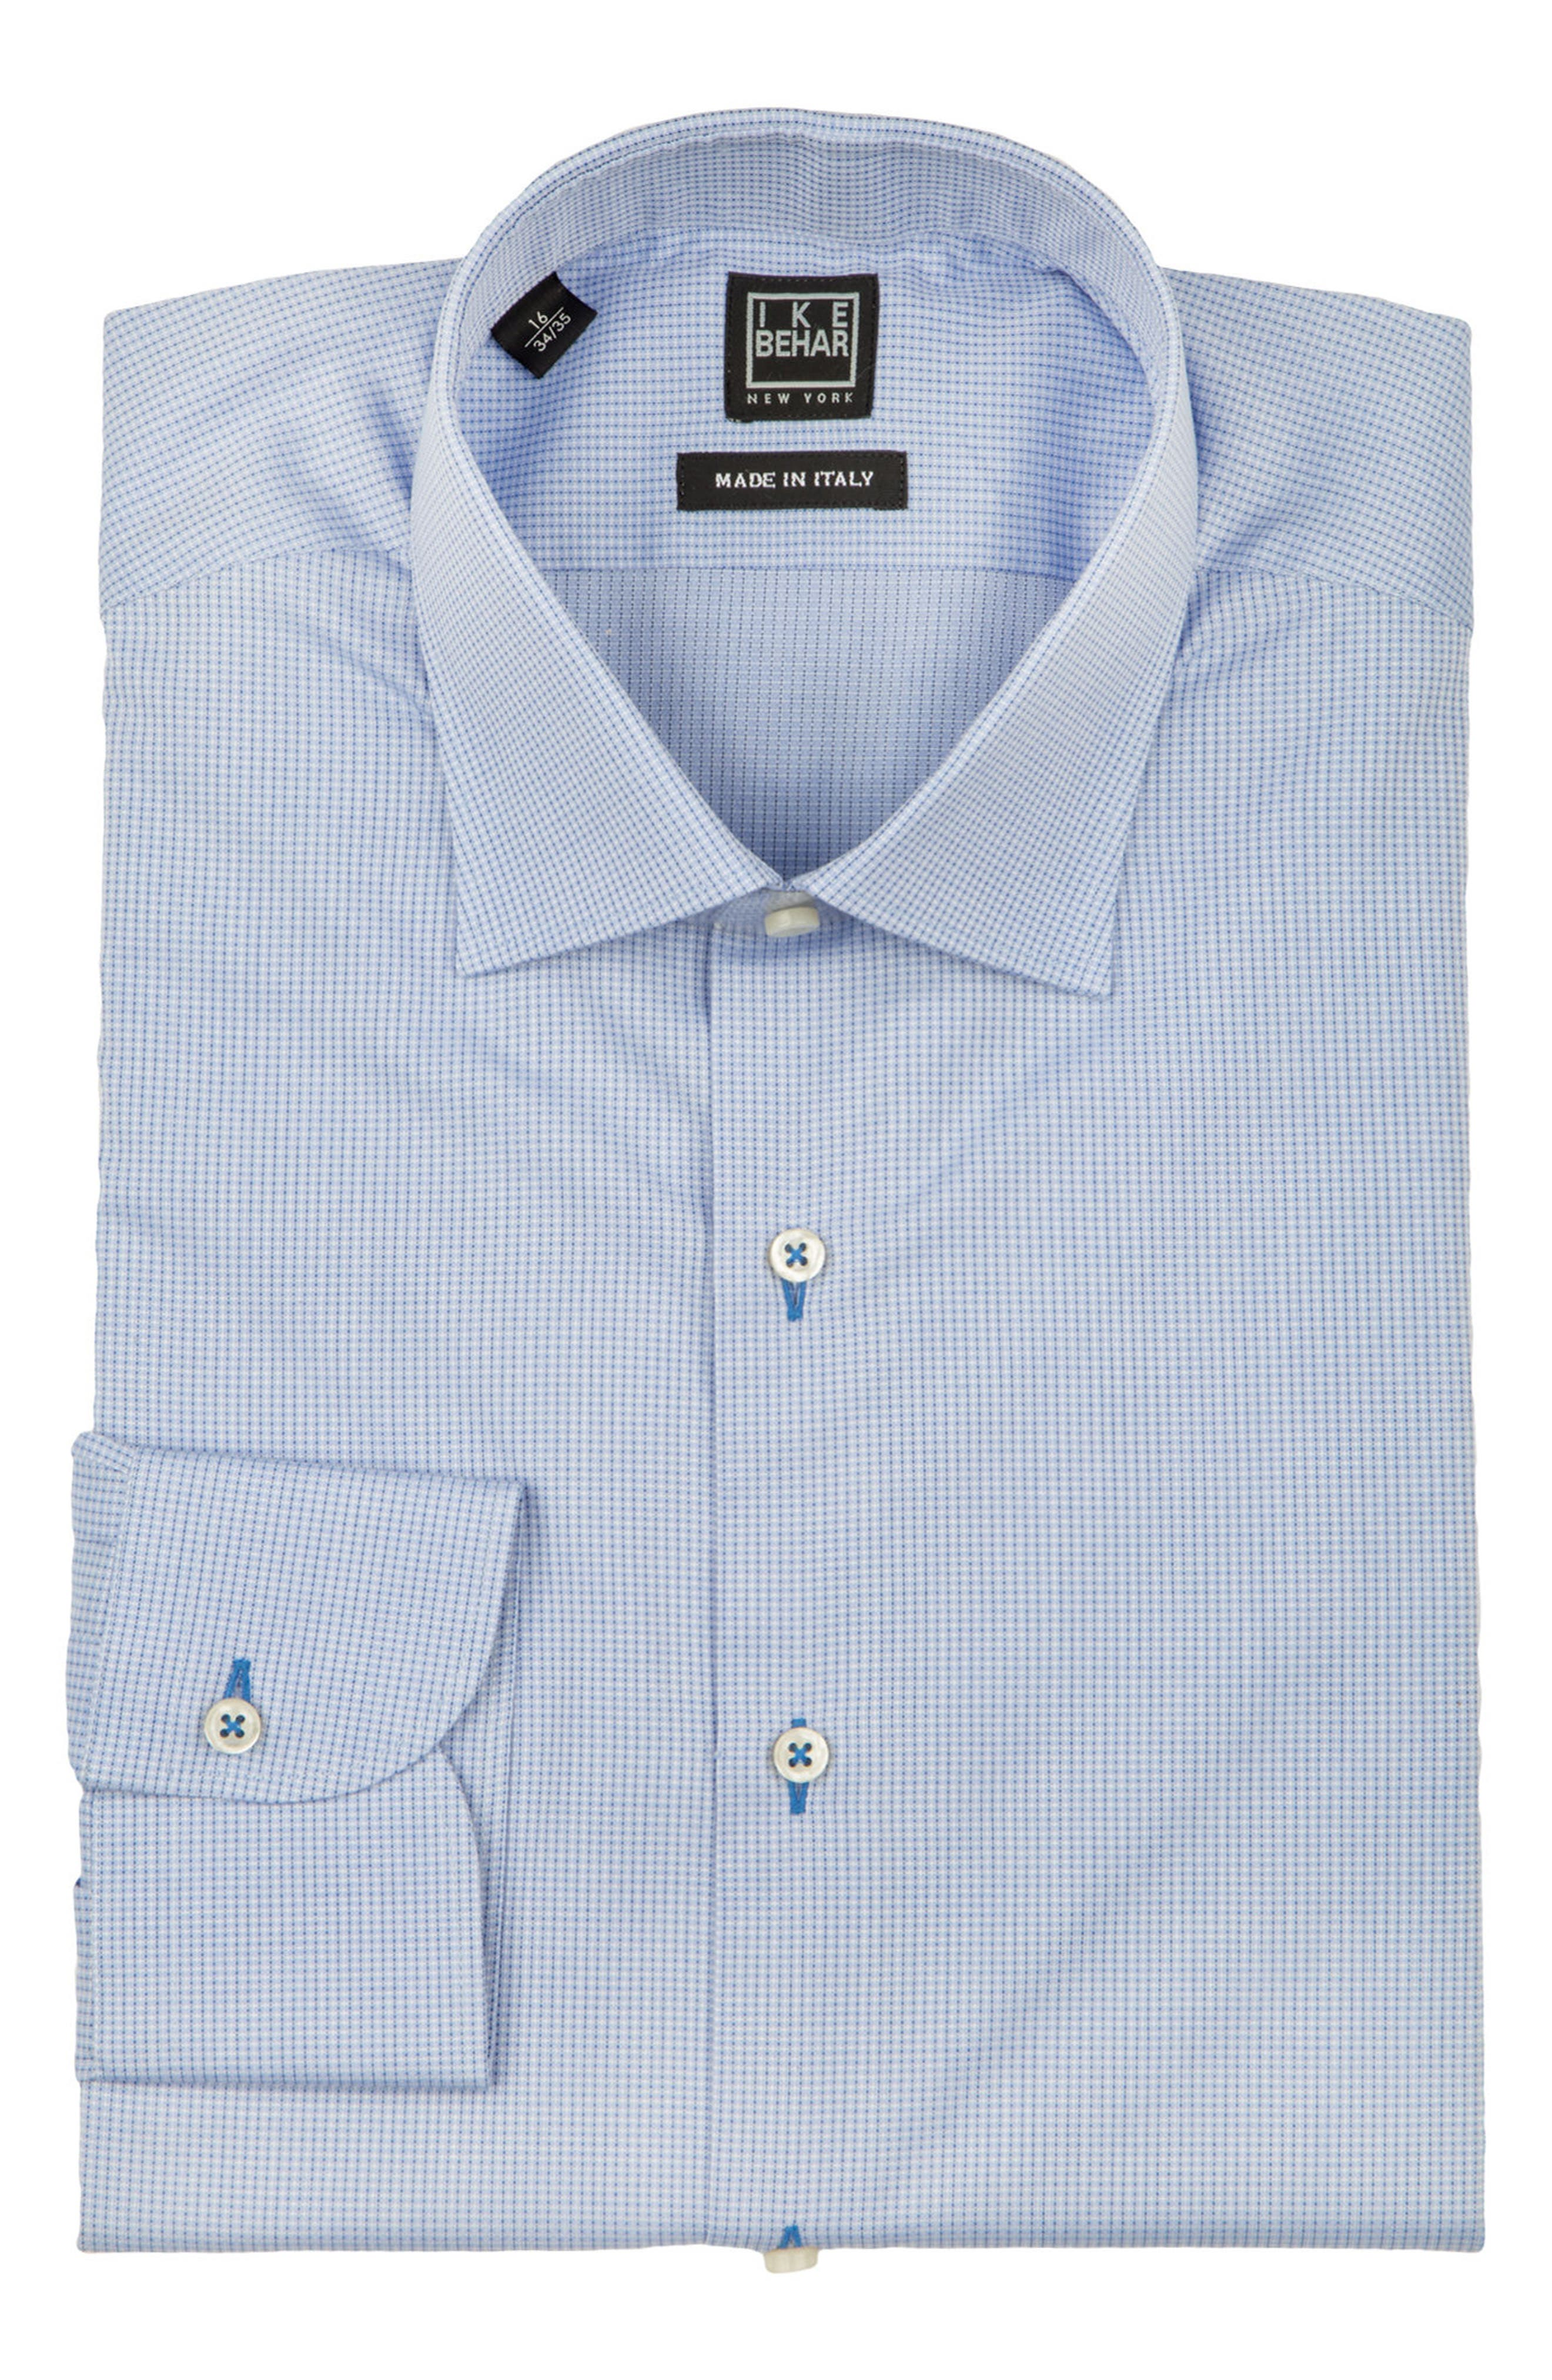 Regular Fit Solid Dress Shirt,                             Alternate thumbnail 5, color,                             LIGHT BLUE